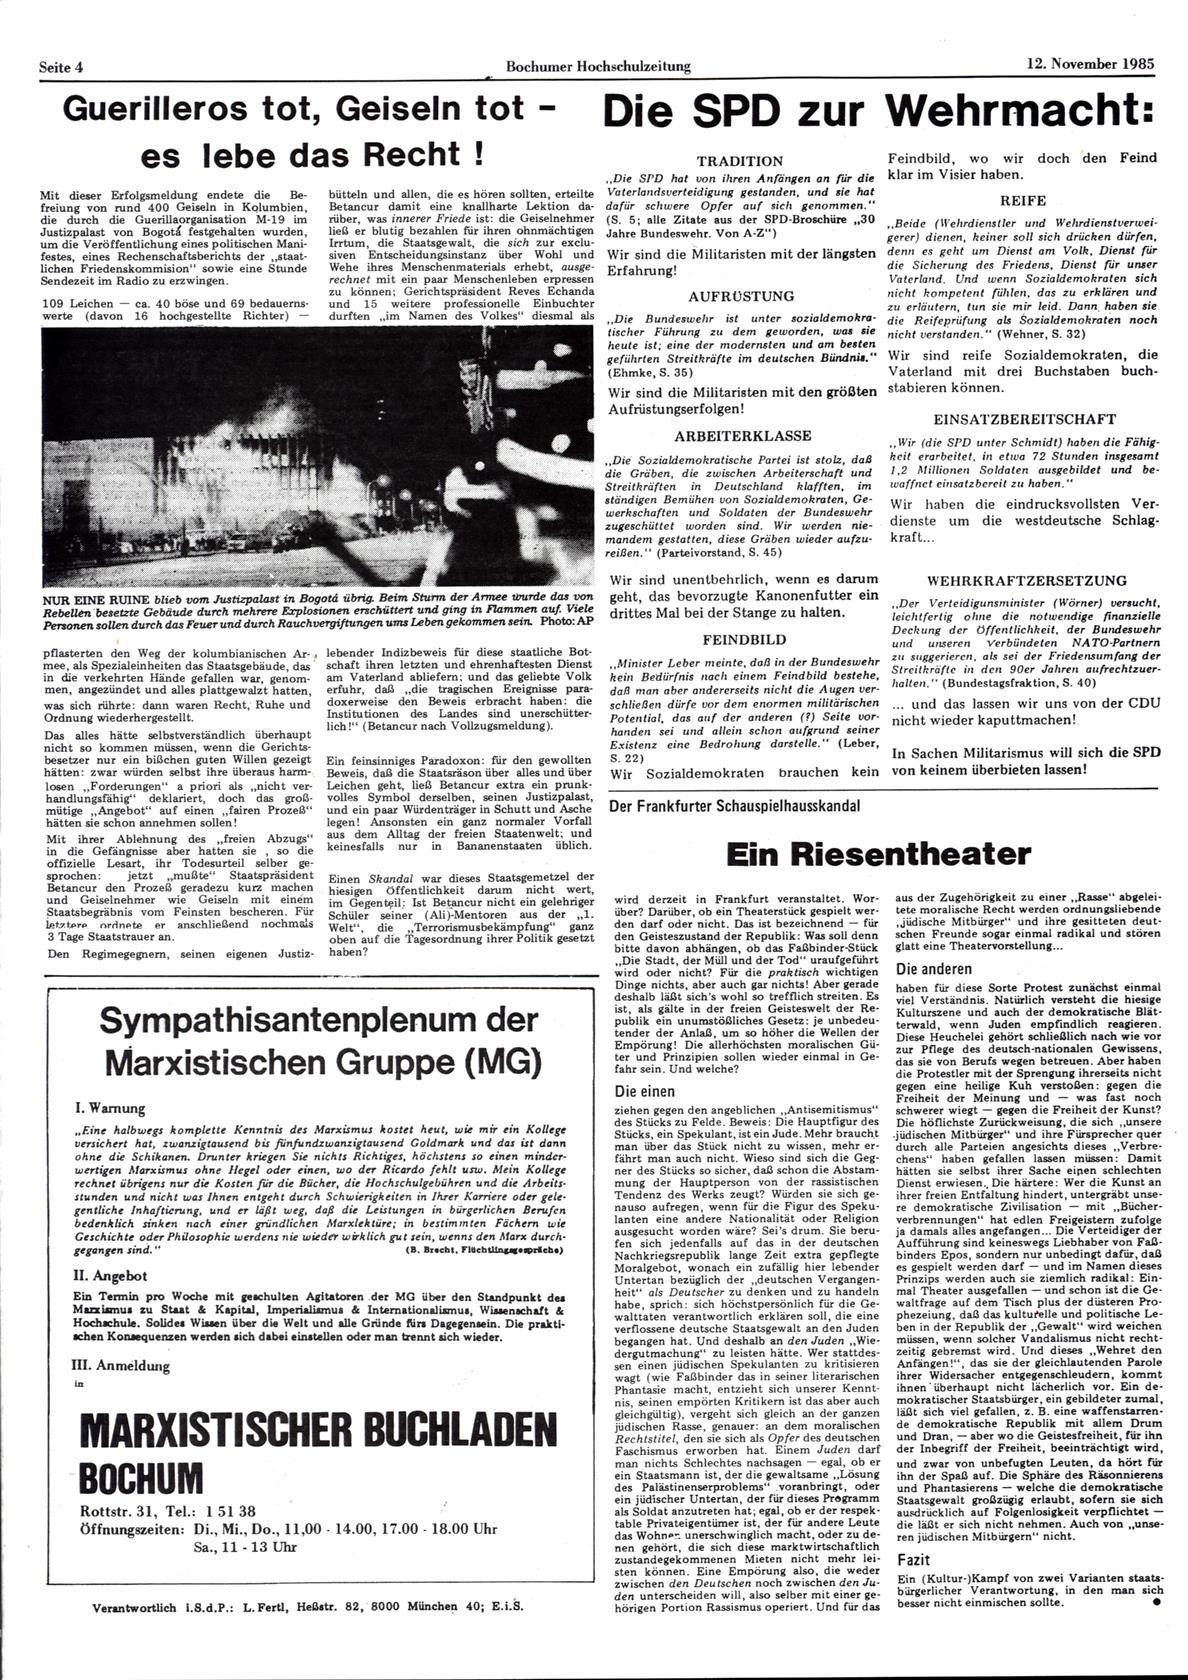 Bochum_BHZ_19851112_118_004